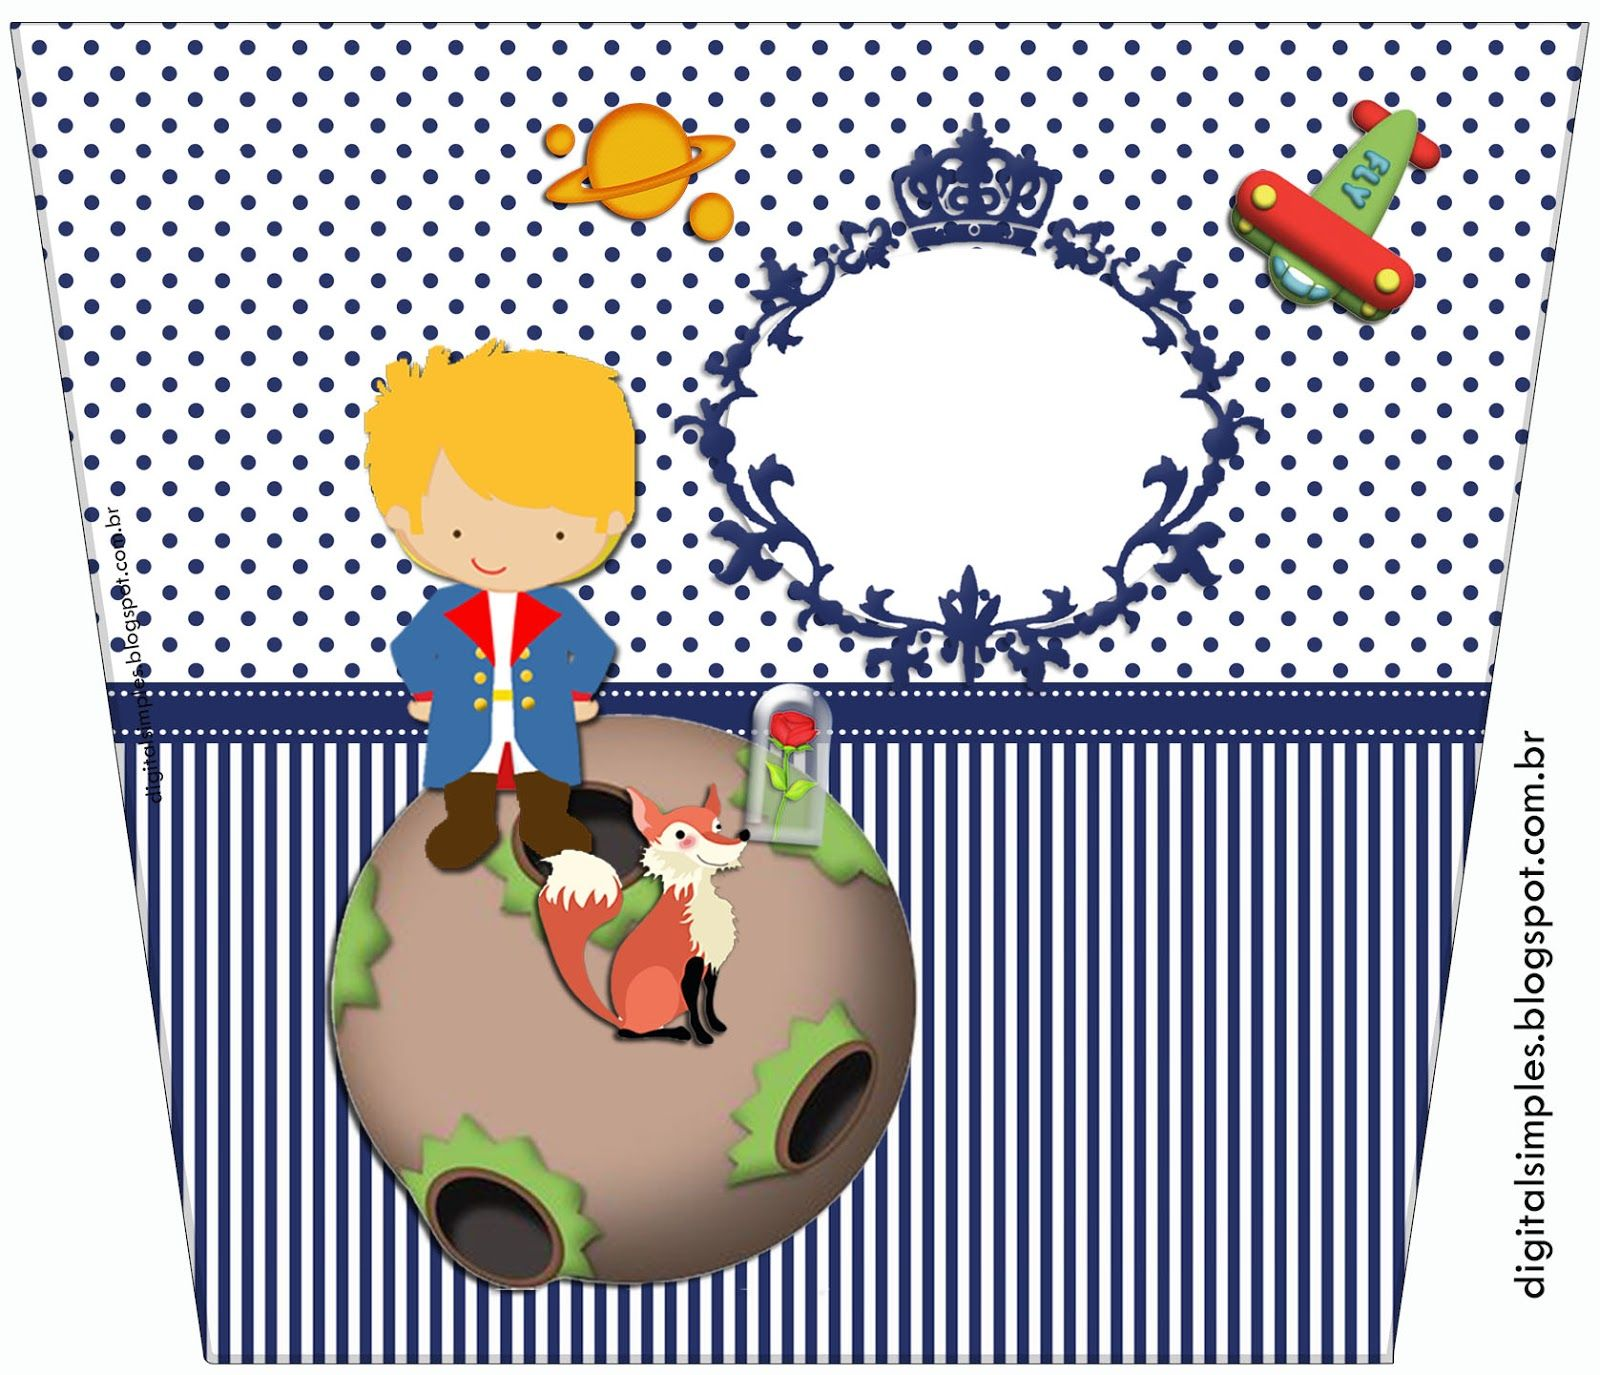 Festa Tema Pequeno Principe Para Imprimir Fiesta Del Principito